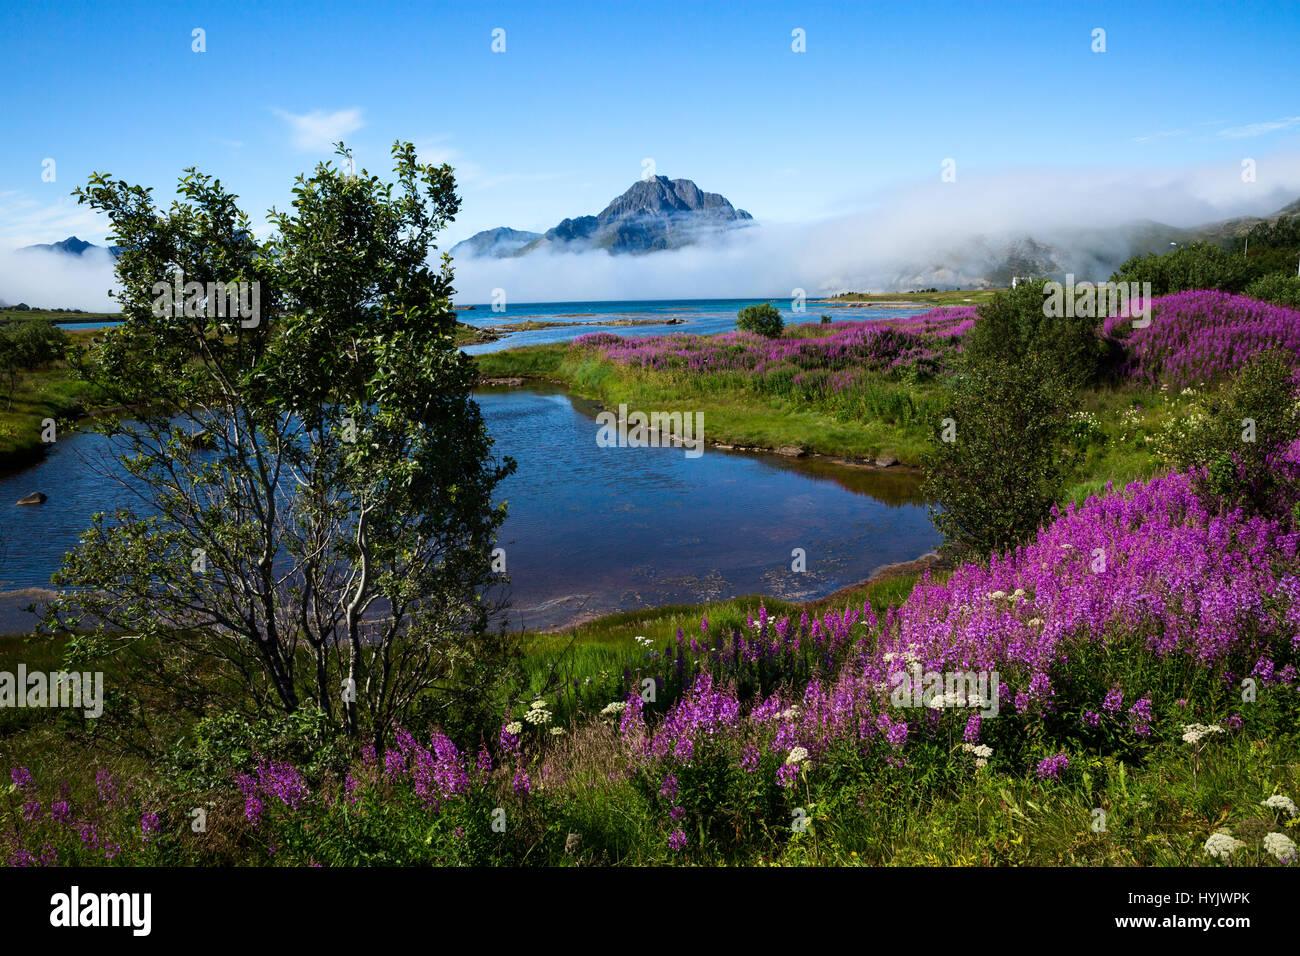 Europe,Norway,Lofoten,Tussan proximity,wildflowers and fof under the mountain peaks - Stock Image